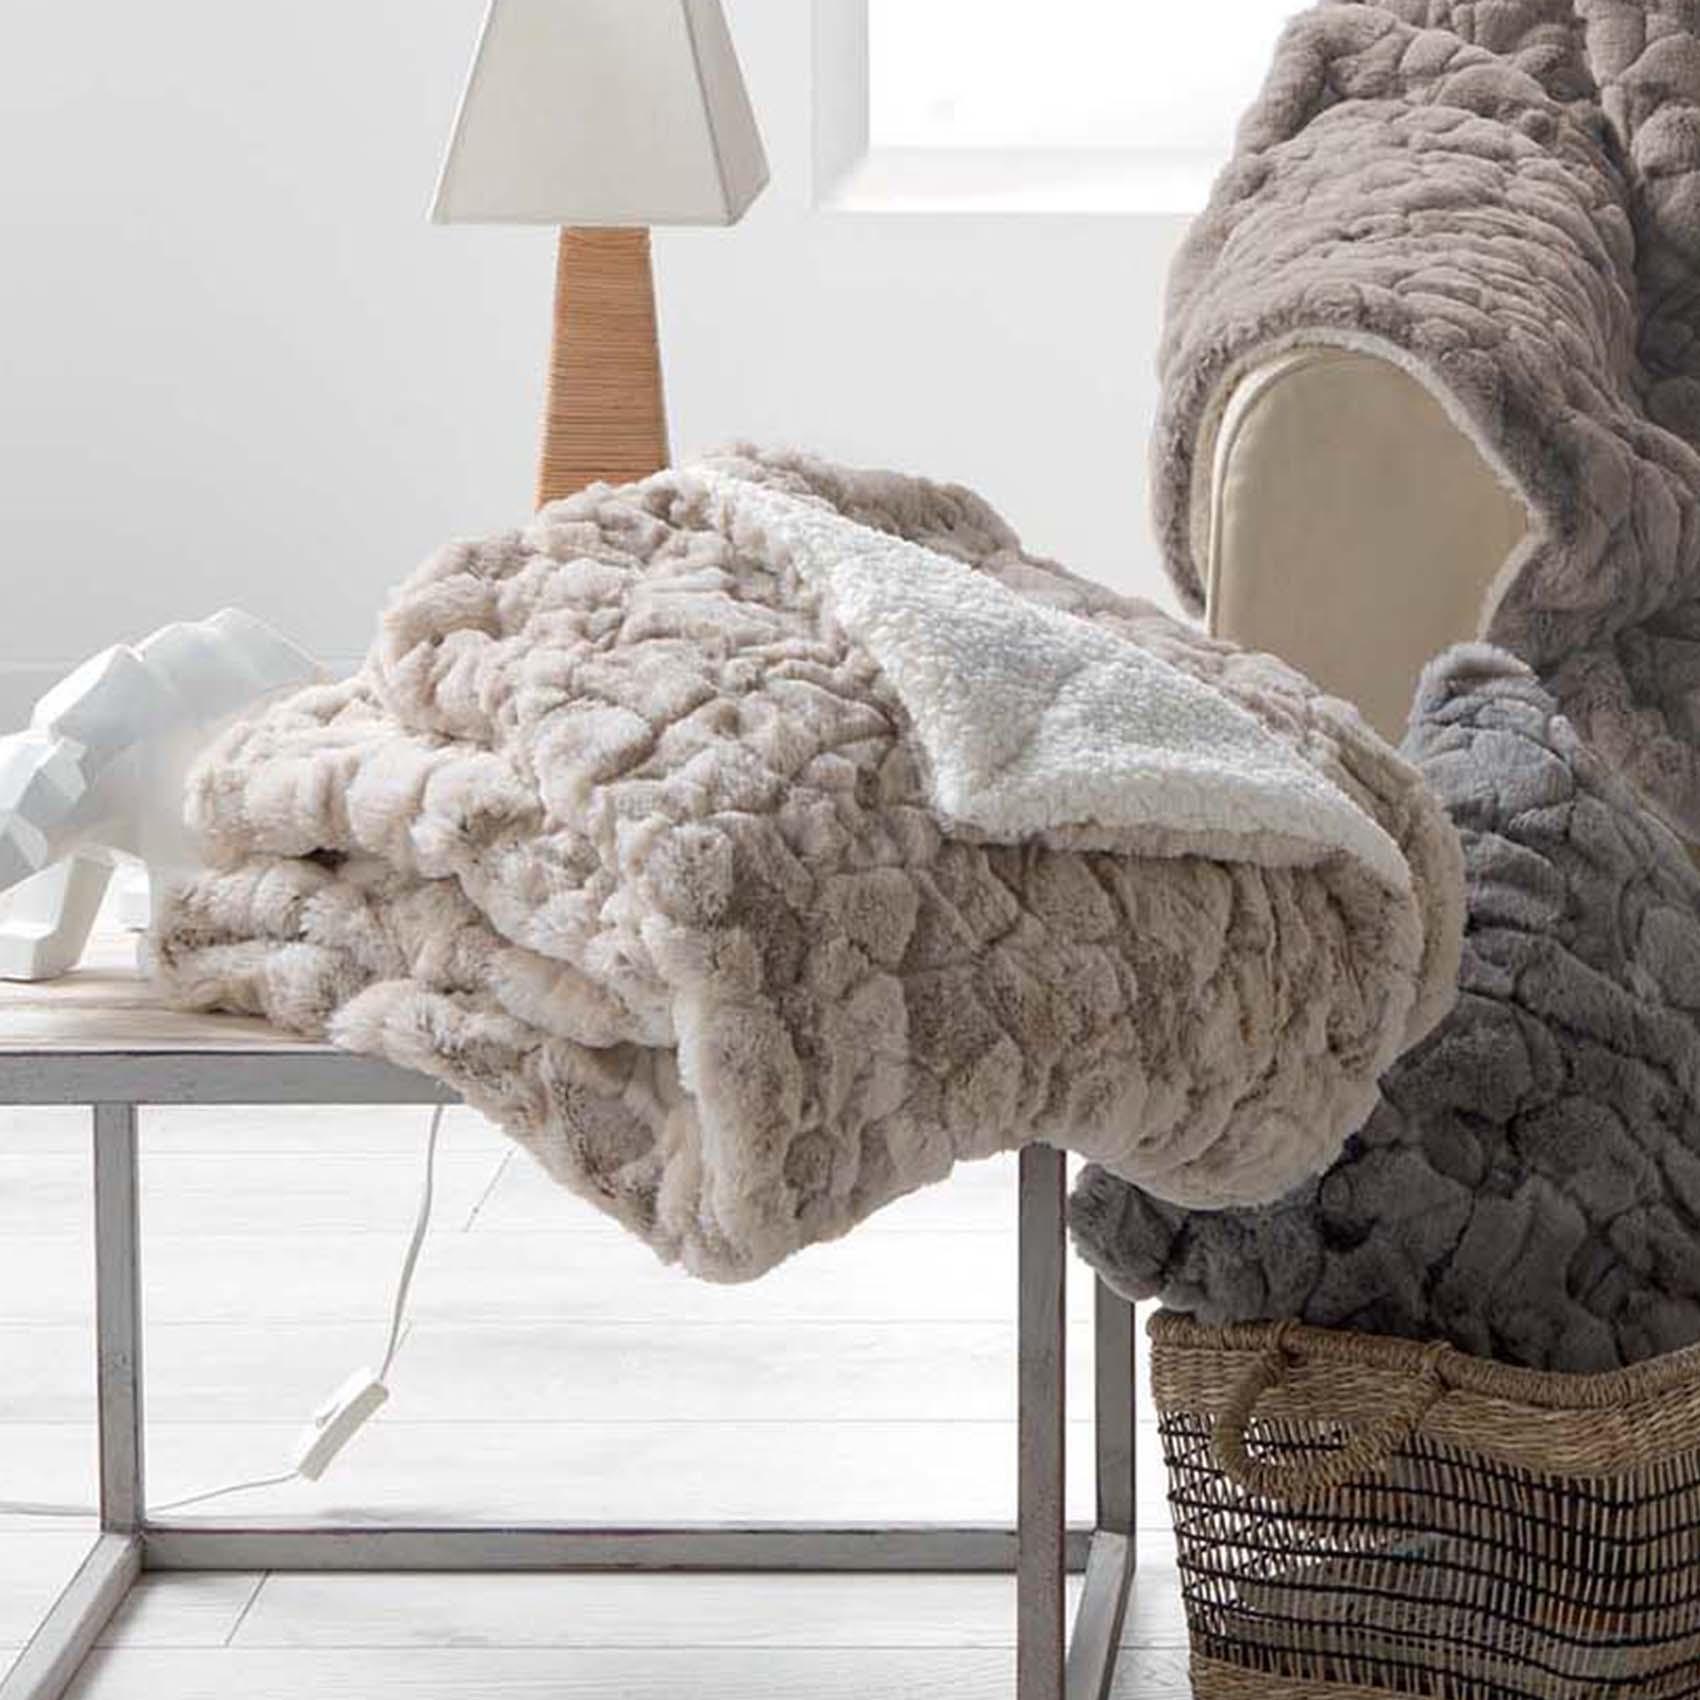 Plaid façon fourrure polyester naturel 150x125